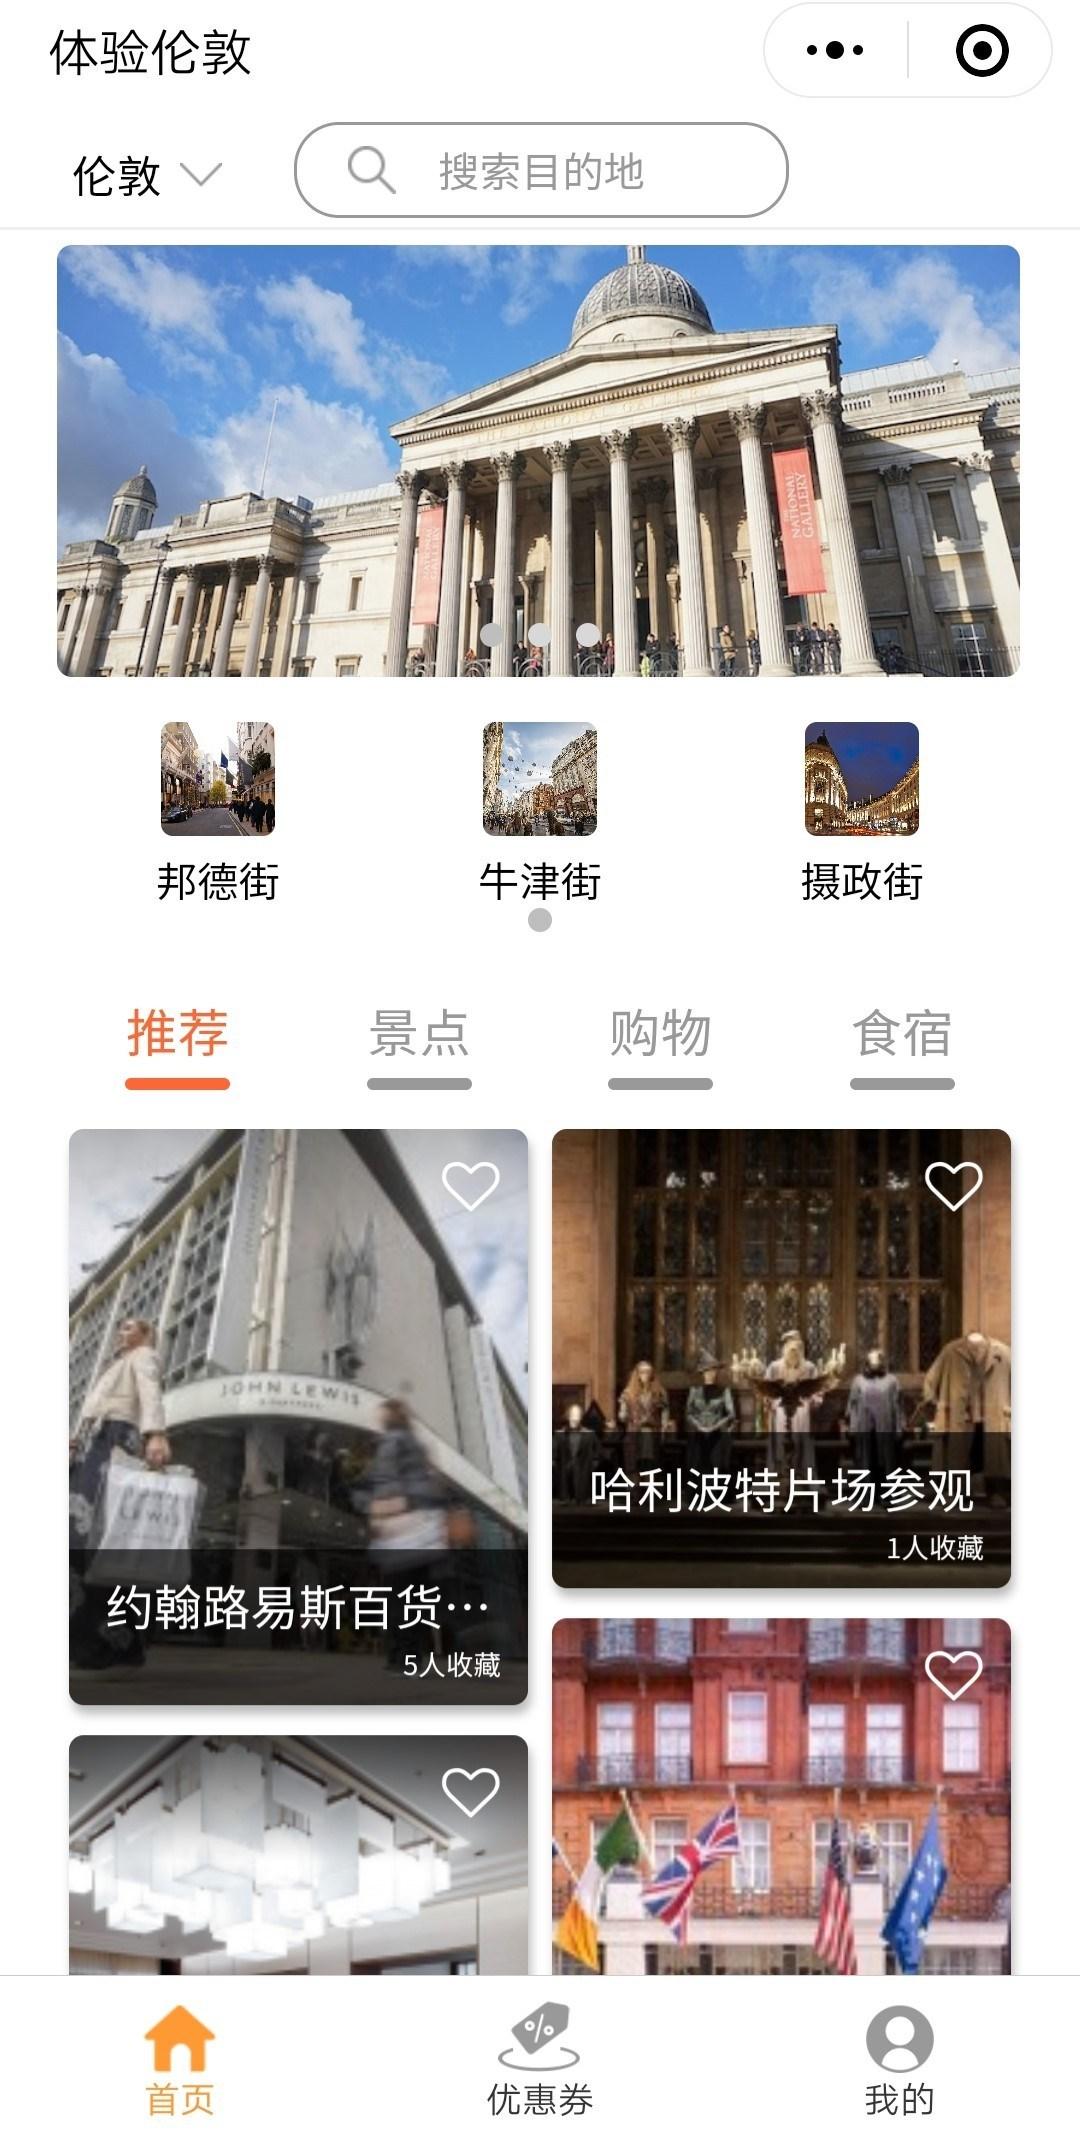 Chinese Social Media Platforms Marketing - EuroPass